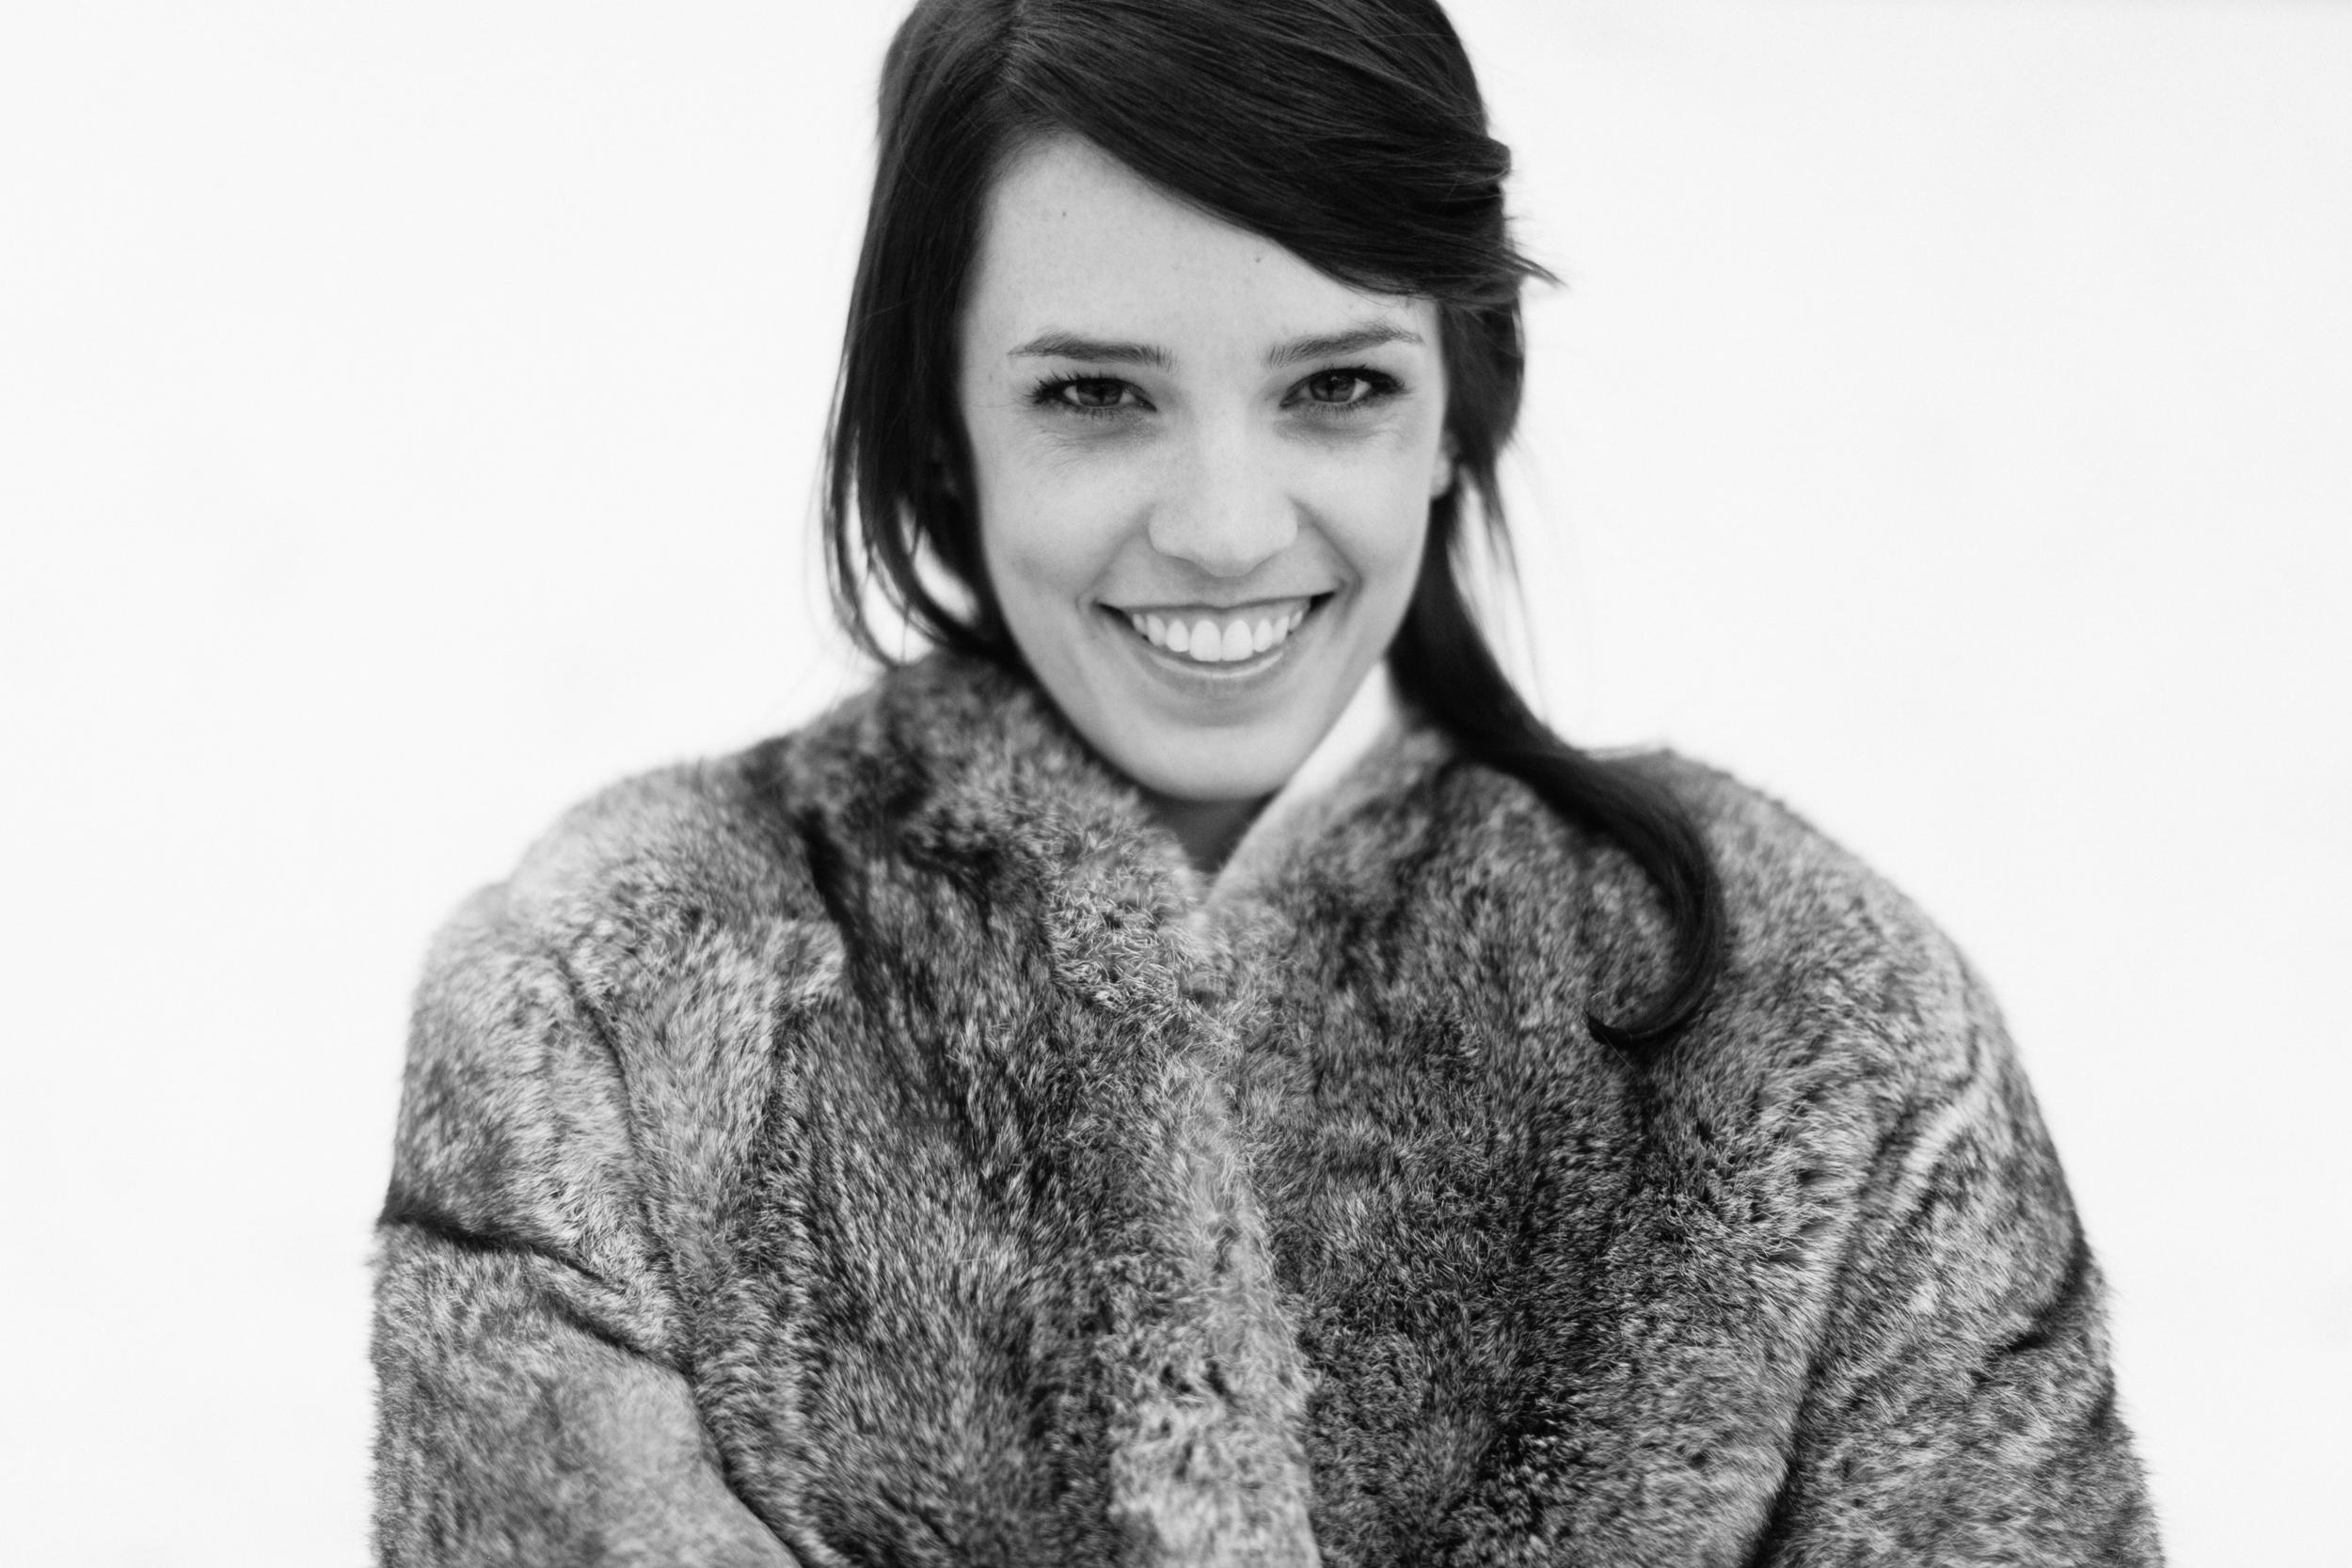 Atlanta-Fashion-Photographer-Kathryn-McCrary-Photography-Snow-Snowlanta-Fur-Coat-29.jpg